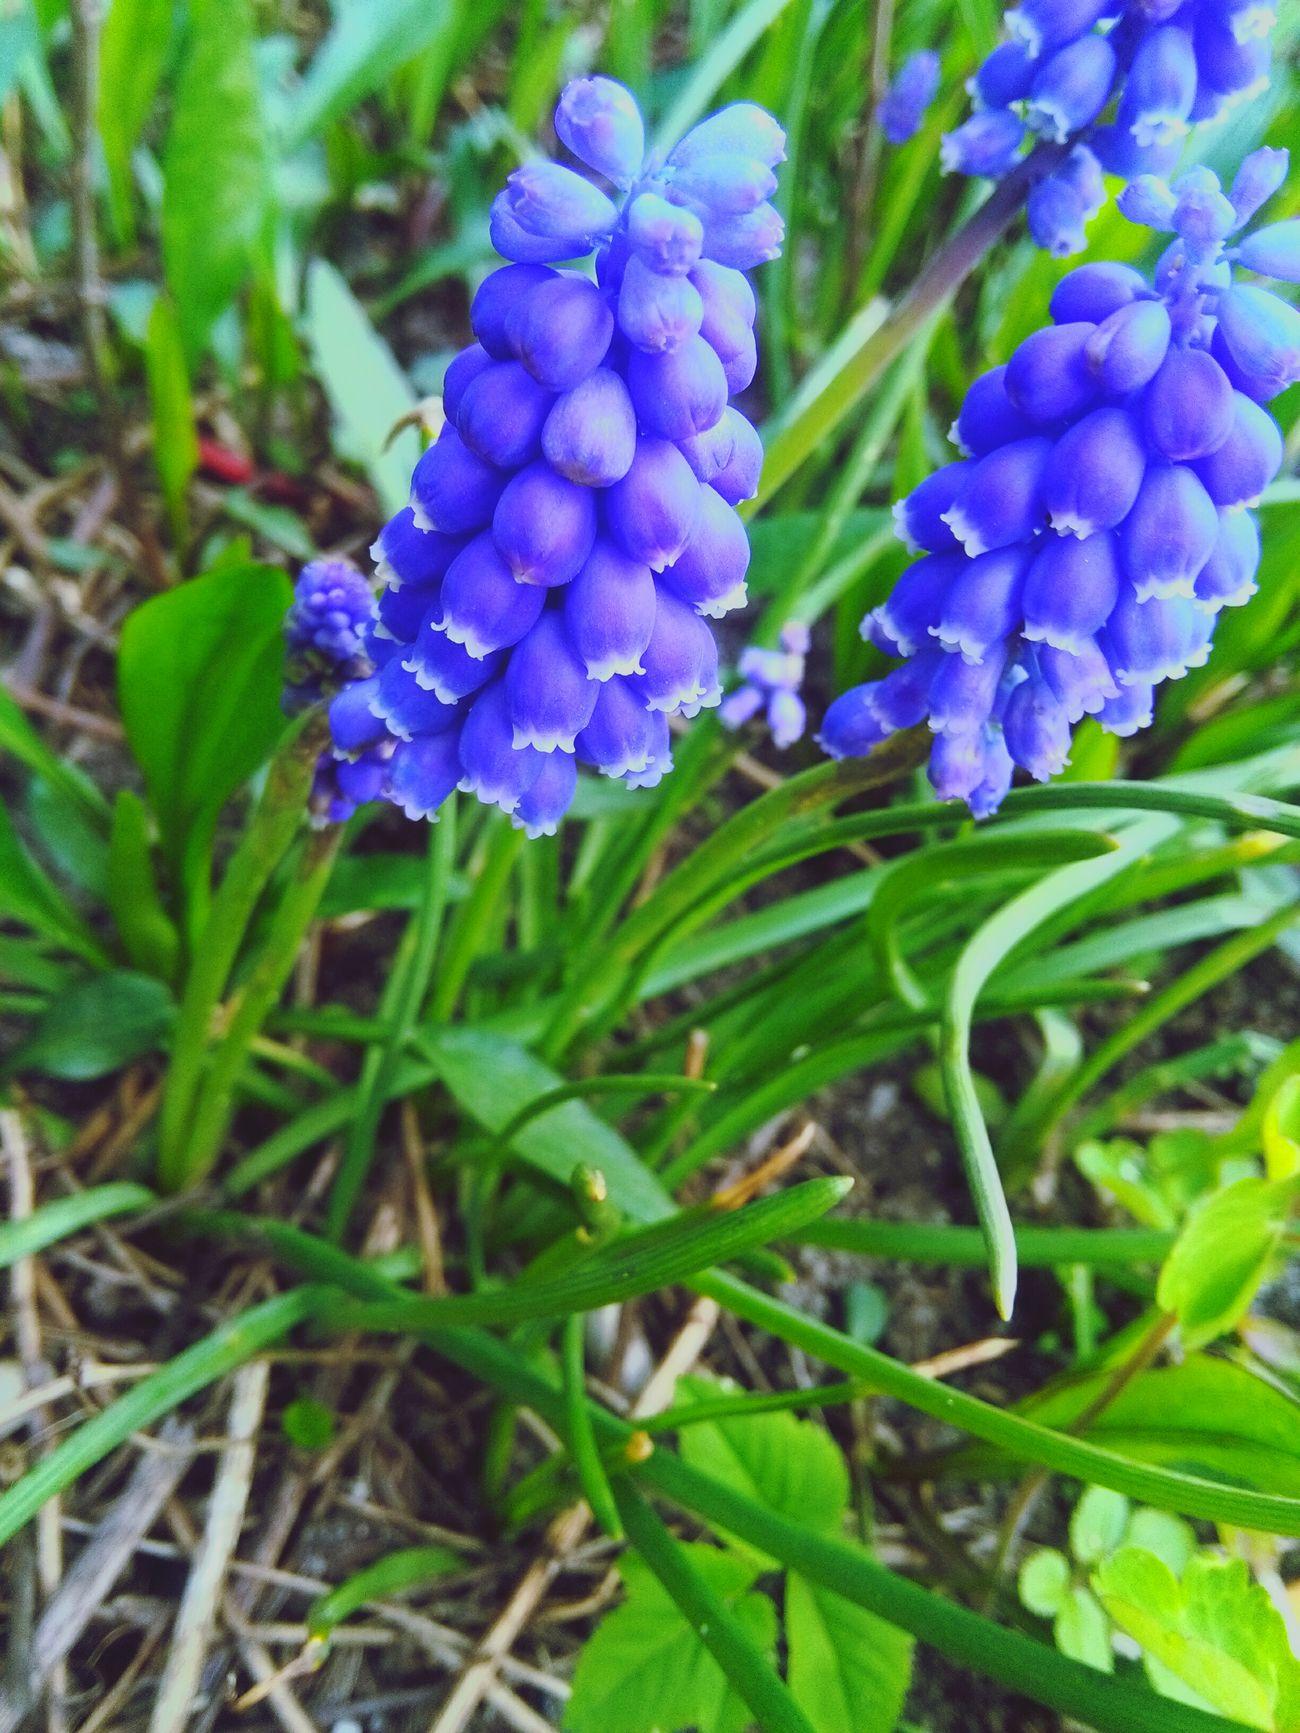 Enjoying Life By Me 👆 Nature Nature Photography Hello World Showcase April MyPhotography Taking Photos